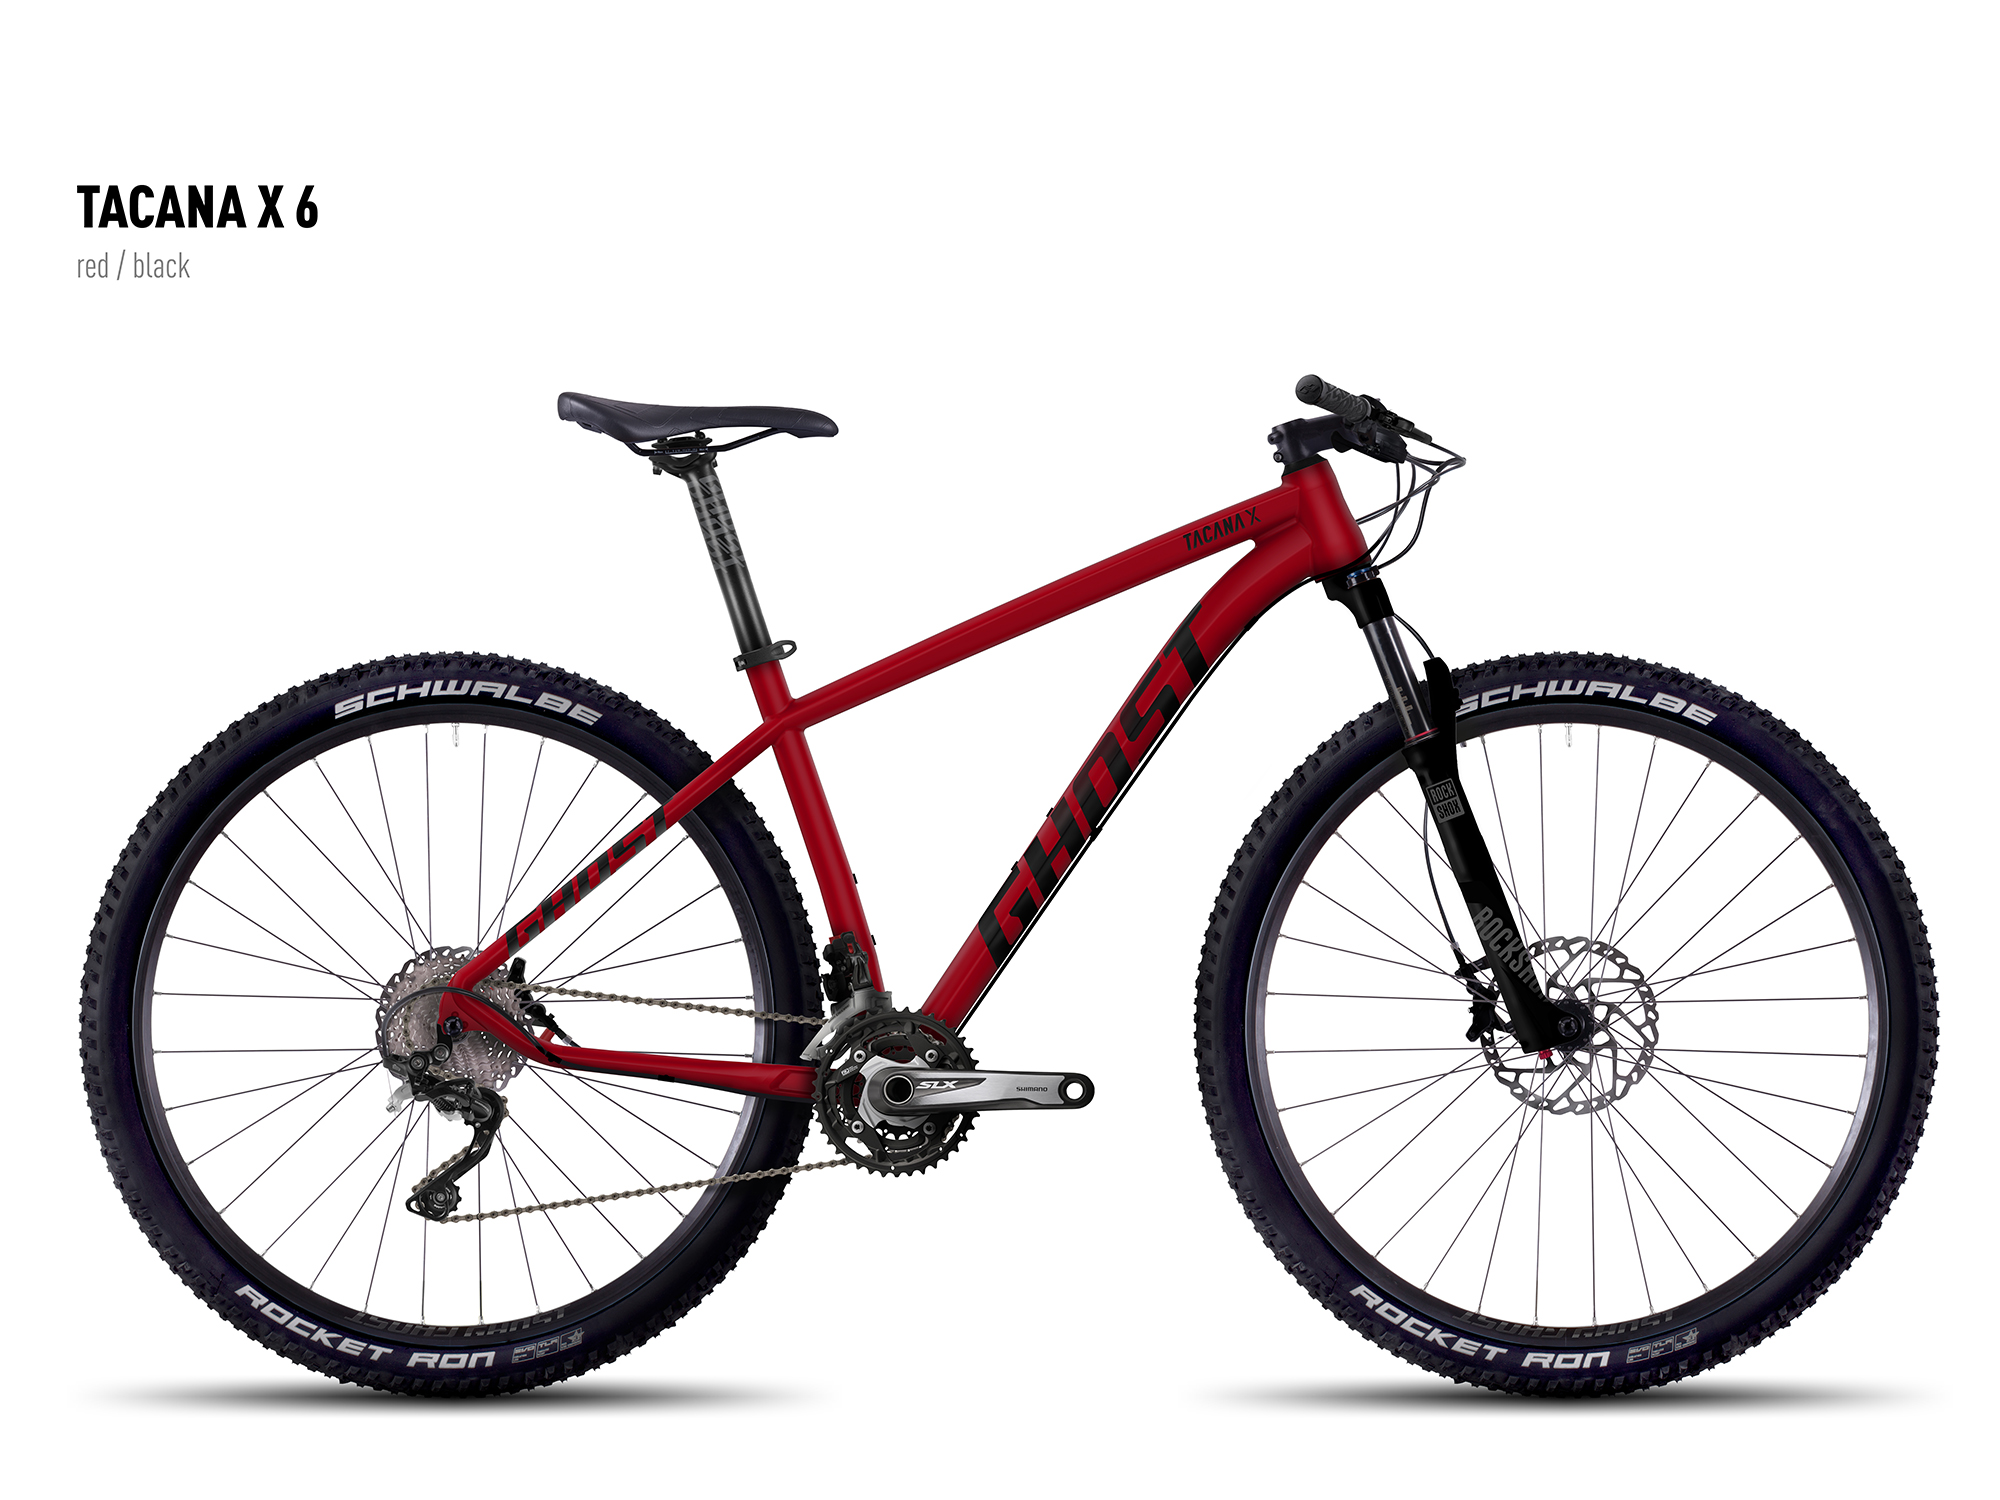 "GHOST Tacana X 6 red/black S / 42cm / 16.5"" , 2016"